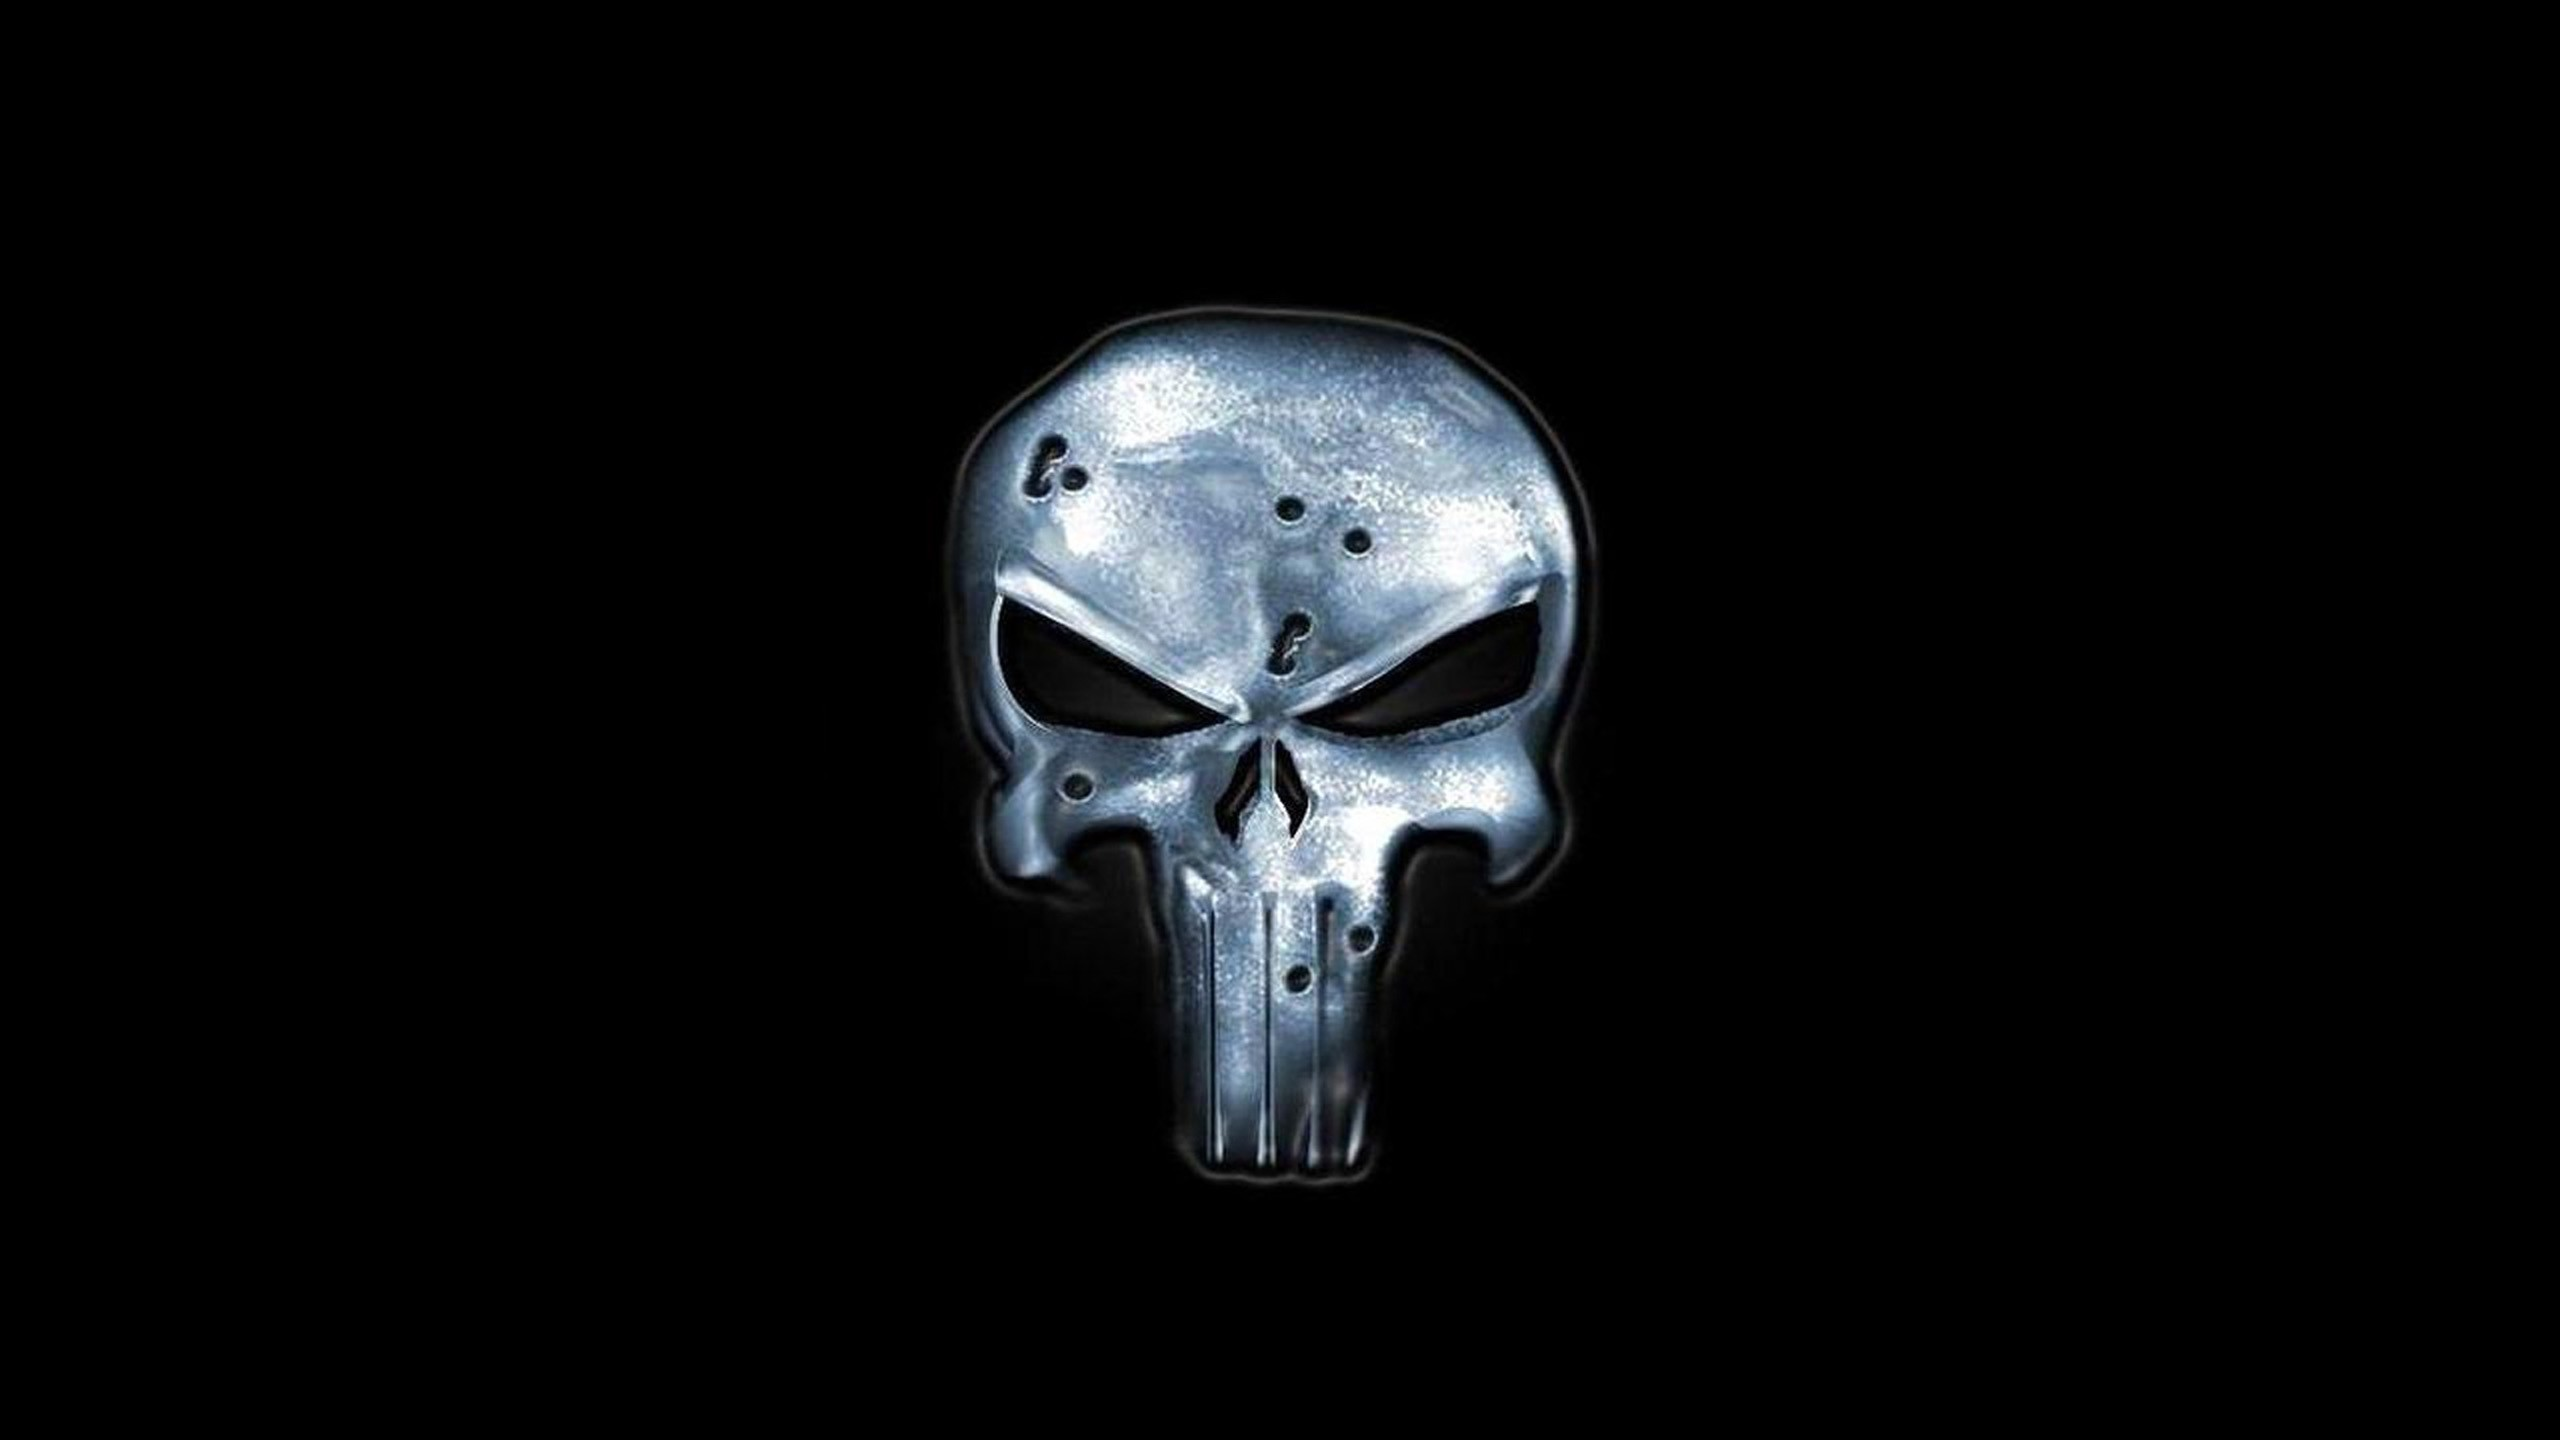 Best Punisher Wallpaper by Lashon Plasencia